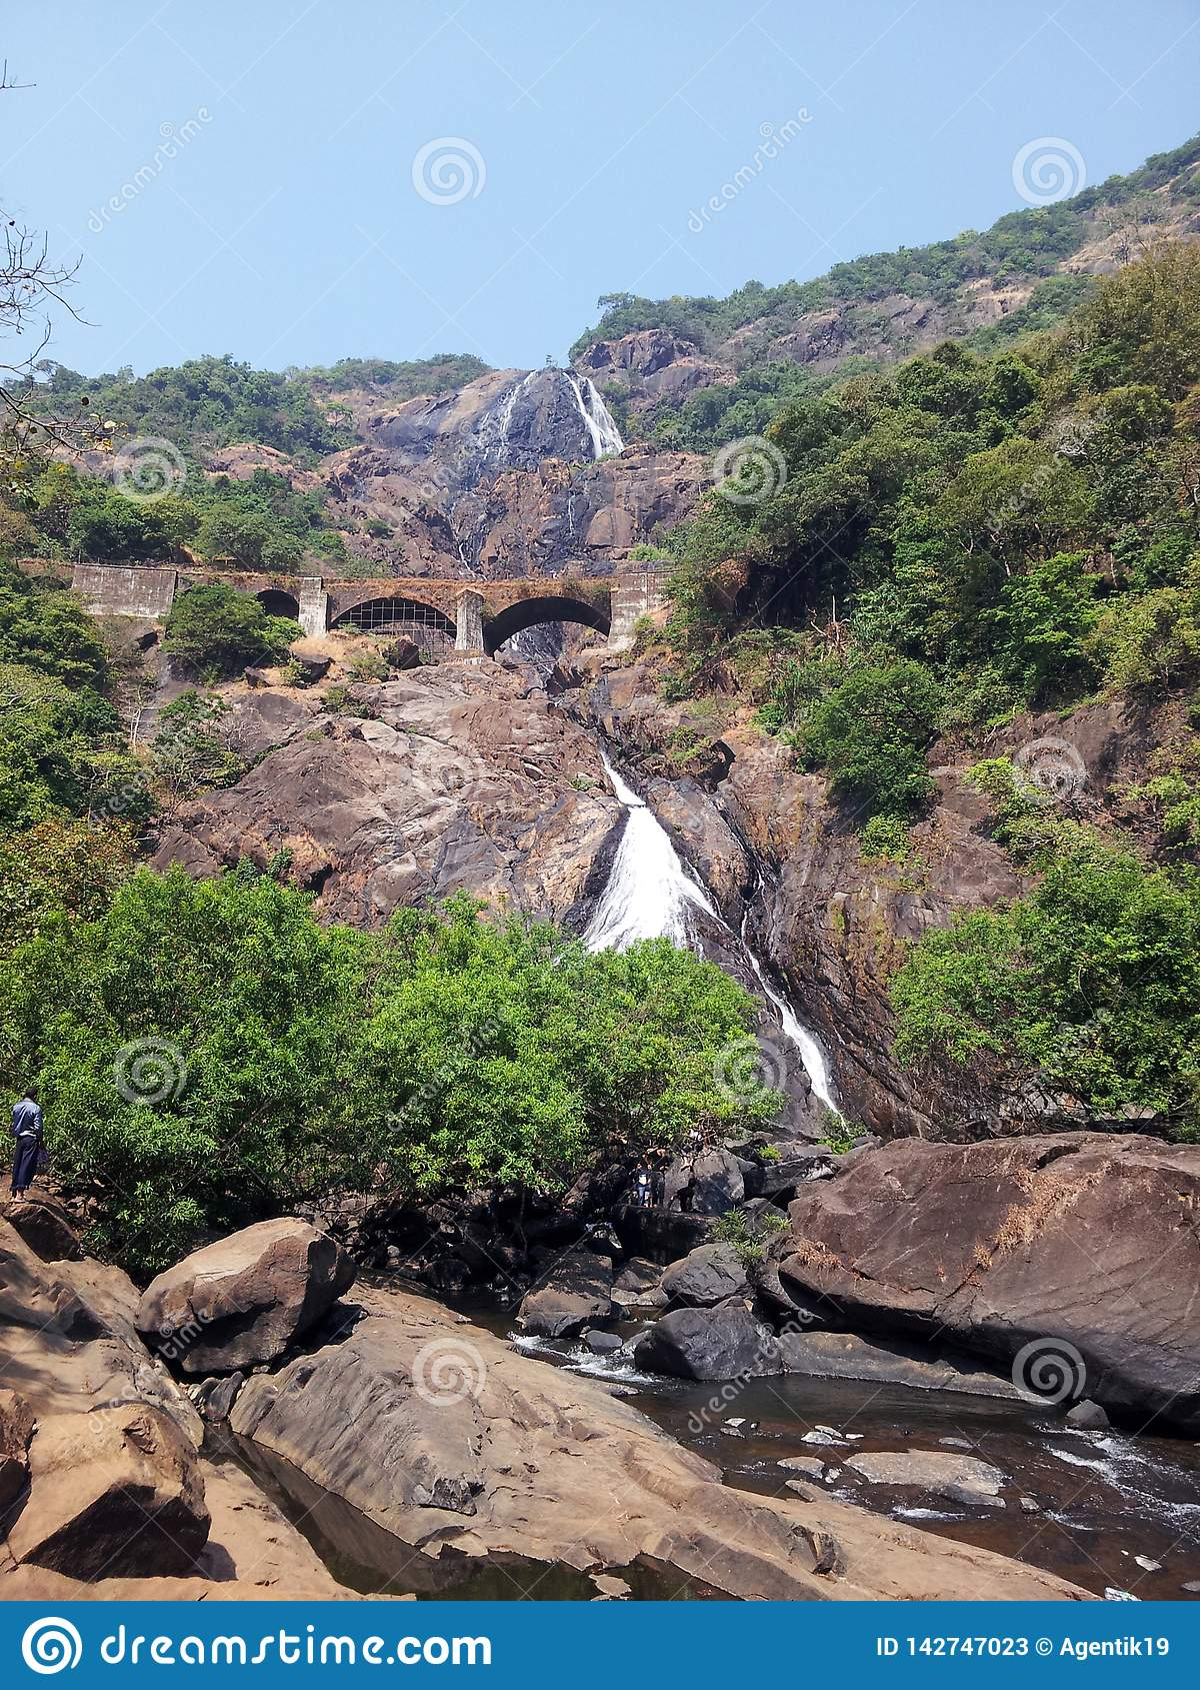 Beautiful view of Dudhsagar waterfall in Goa